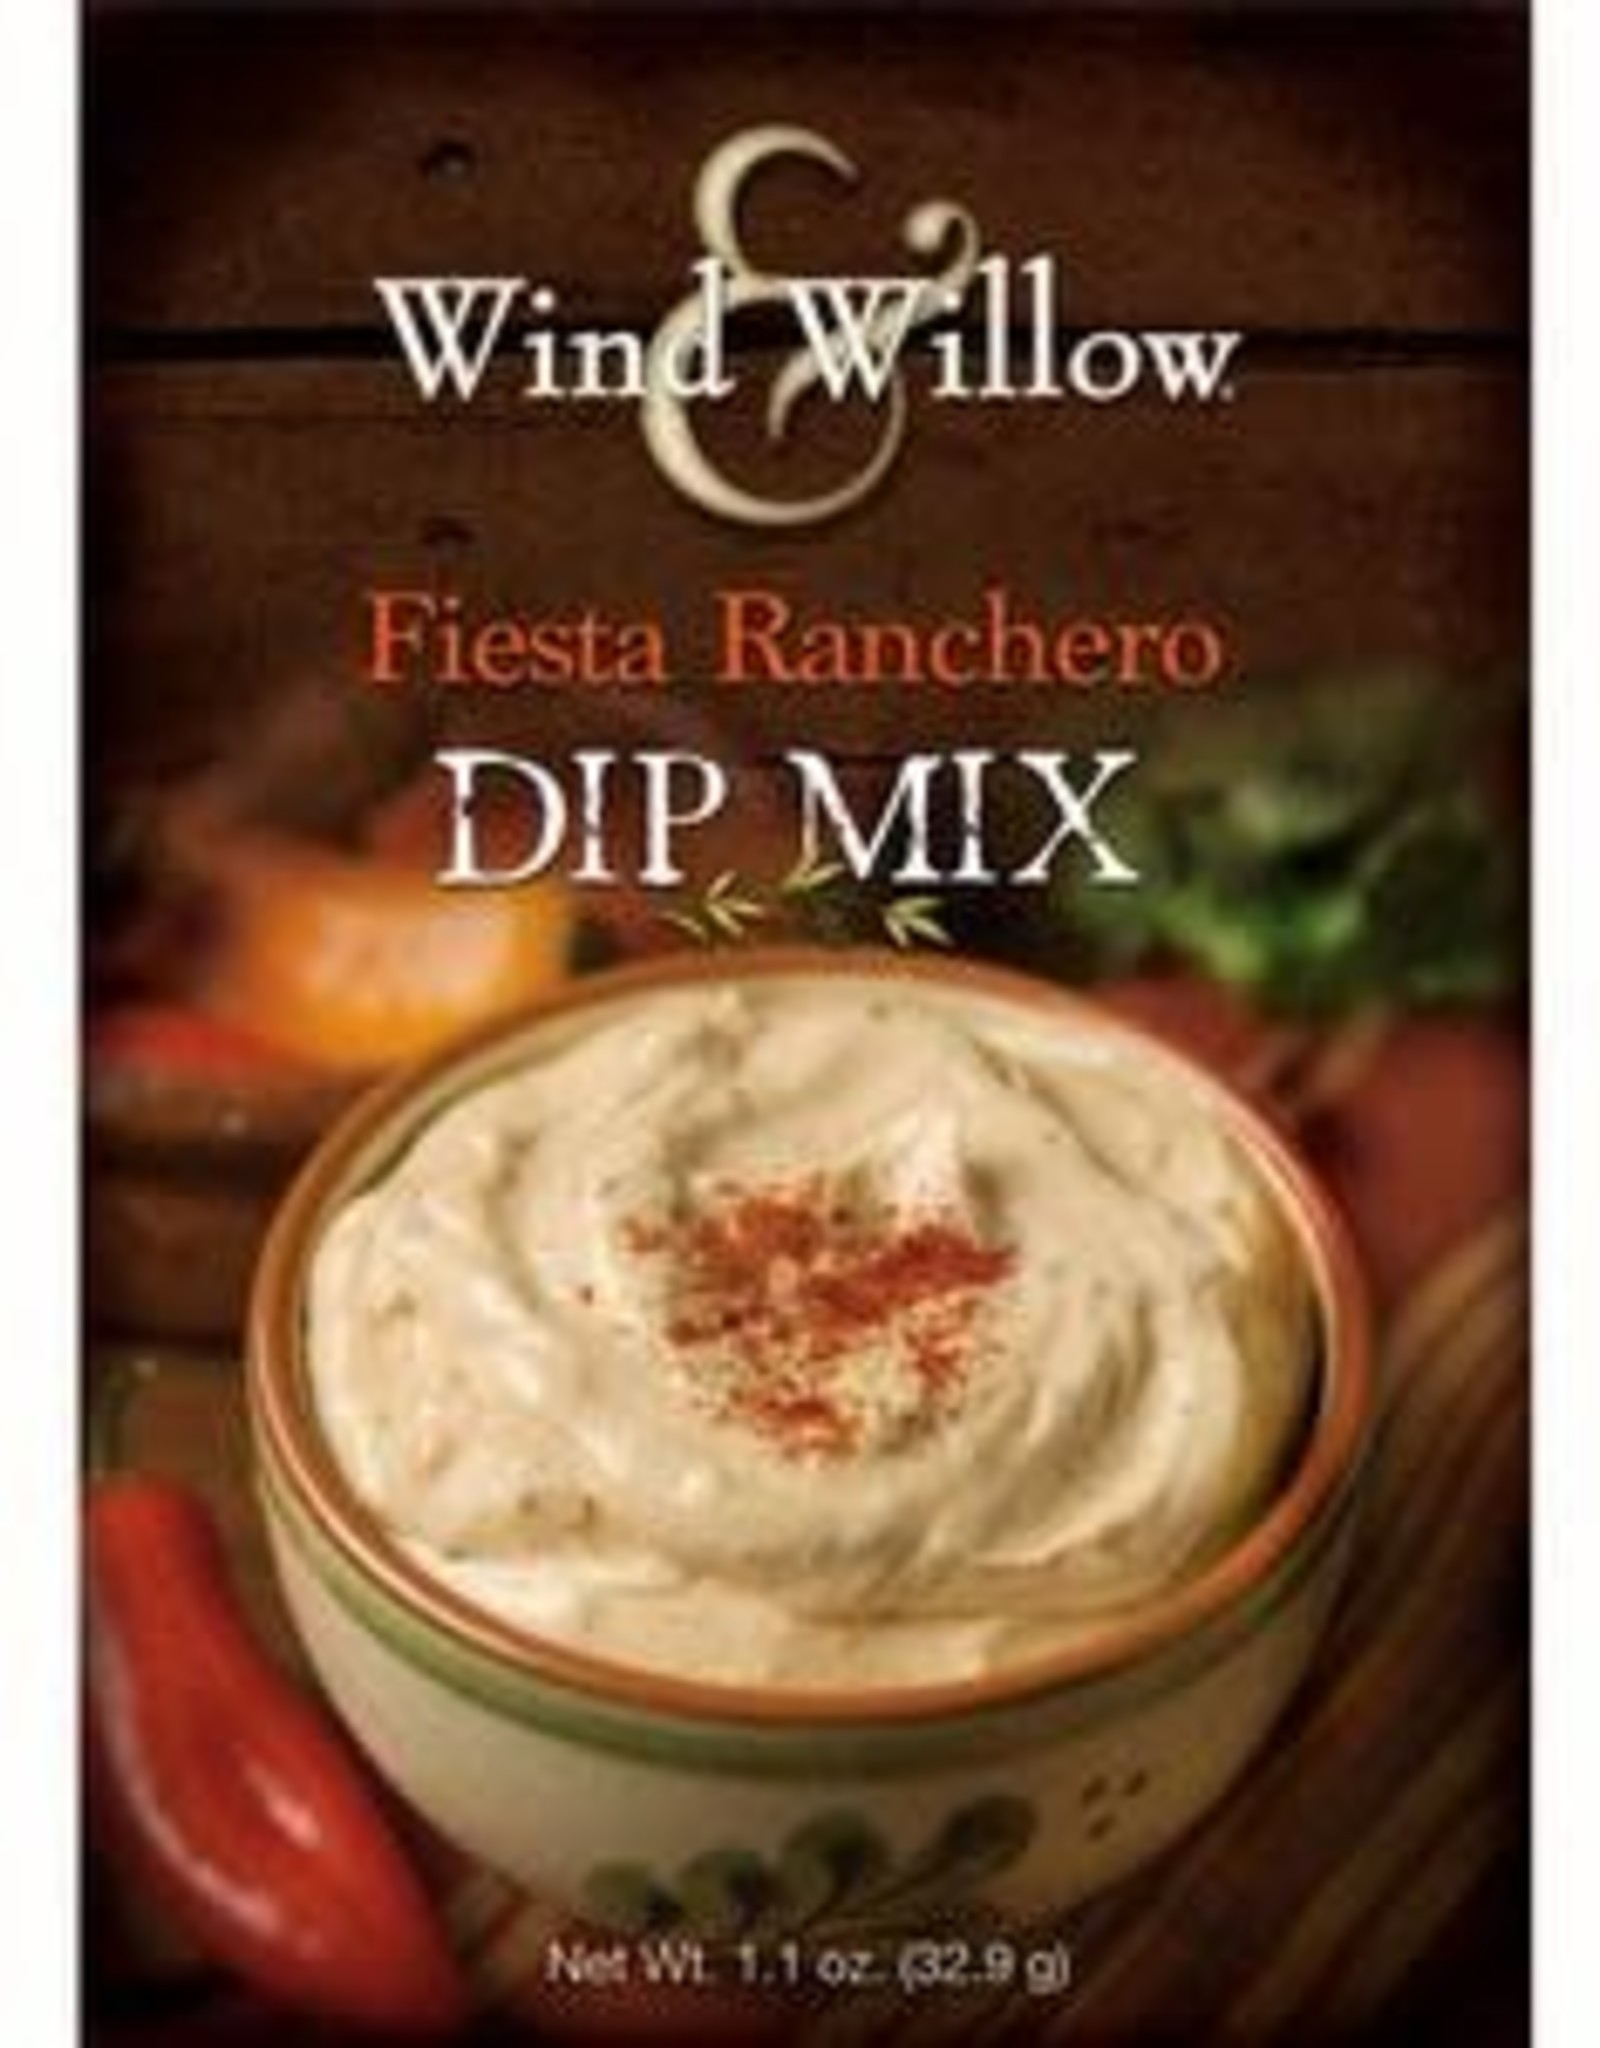 Wind & Willow Fiesta Ranchero